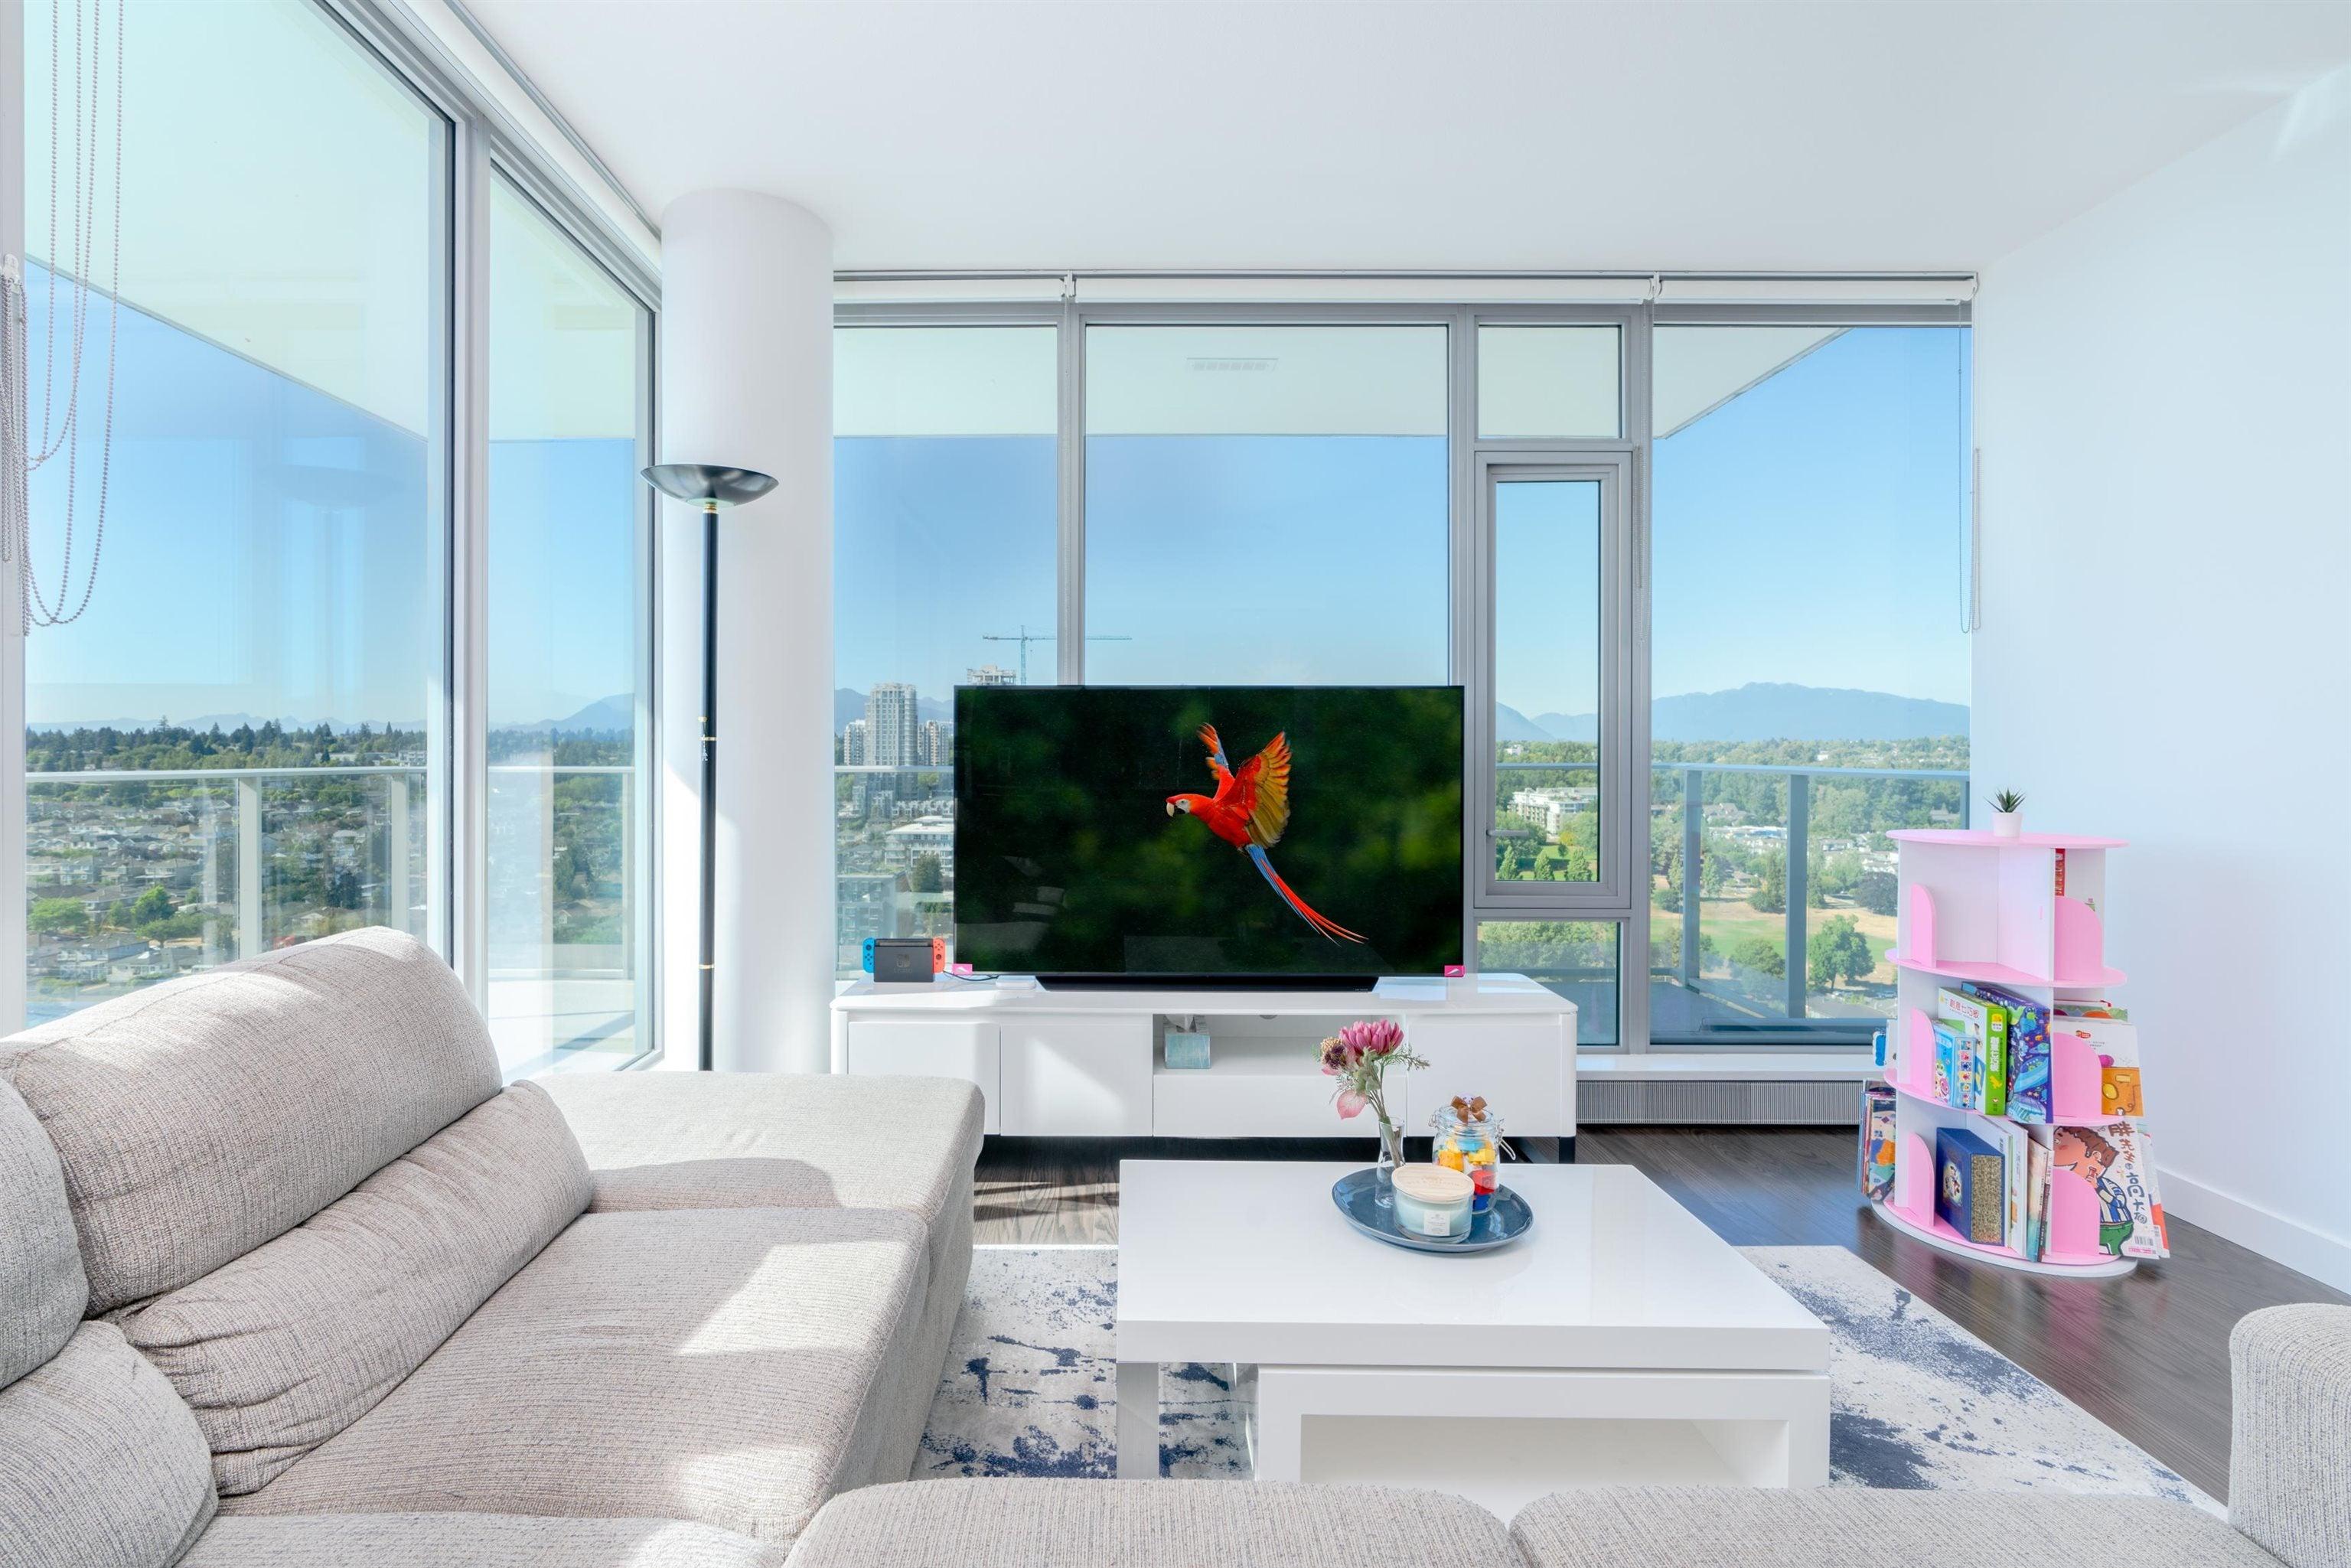 PH2601 8031 NUNAVUT LANE - Marpole Apartment/Condo for sale, 2 Bedrooms (R2627931)